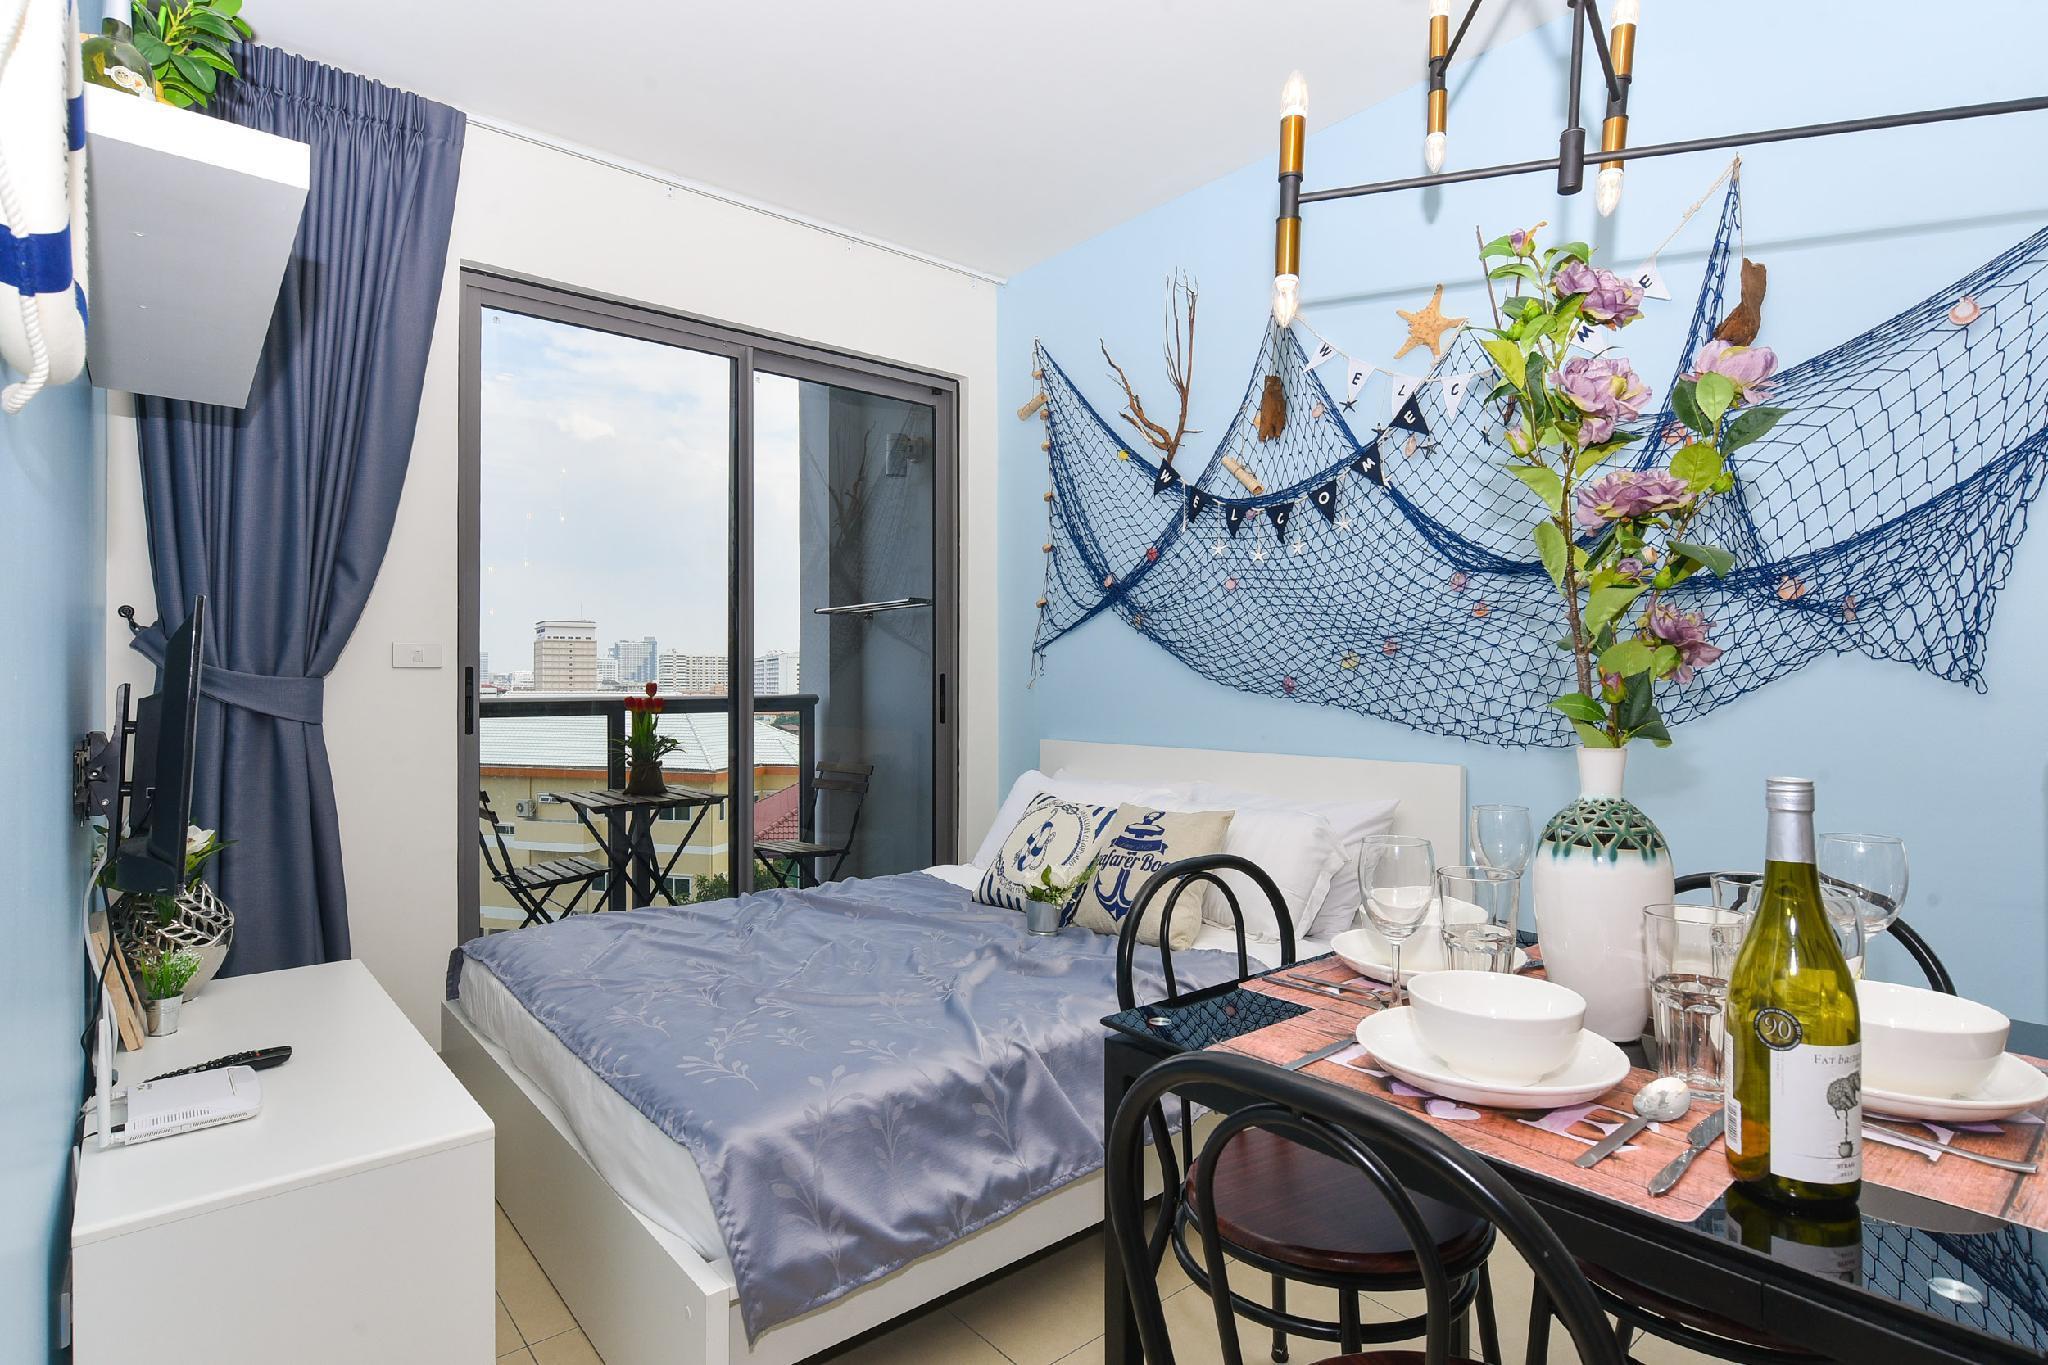 1-4PAX Double Bed Luxury 10min Balihai [B-Beach] อพาร์ตเมนต์ 1 ห้องนอน 1 ห้องน้ำส่วนตัว ขนาด 35 ตร.ม. – พัทยาใต้